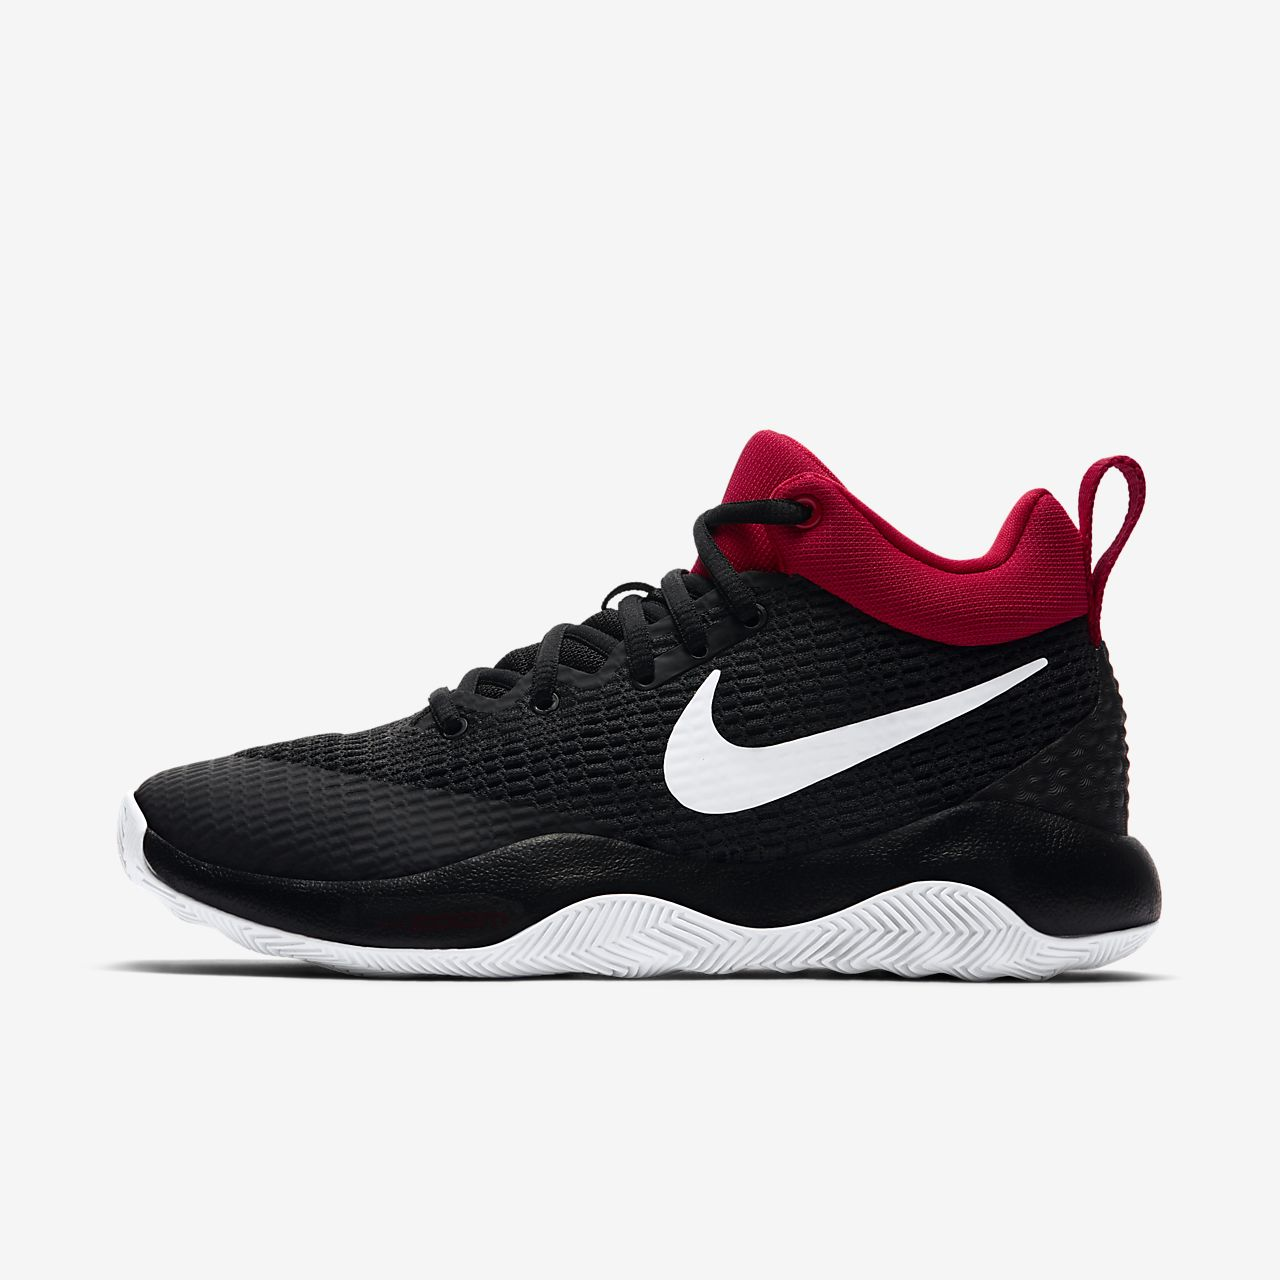 ... Nike Zoom Rev Women's Basketball Shoe